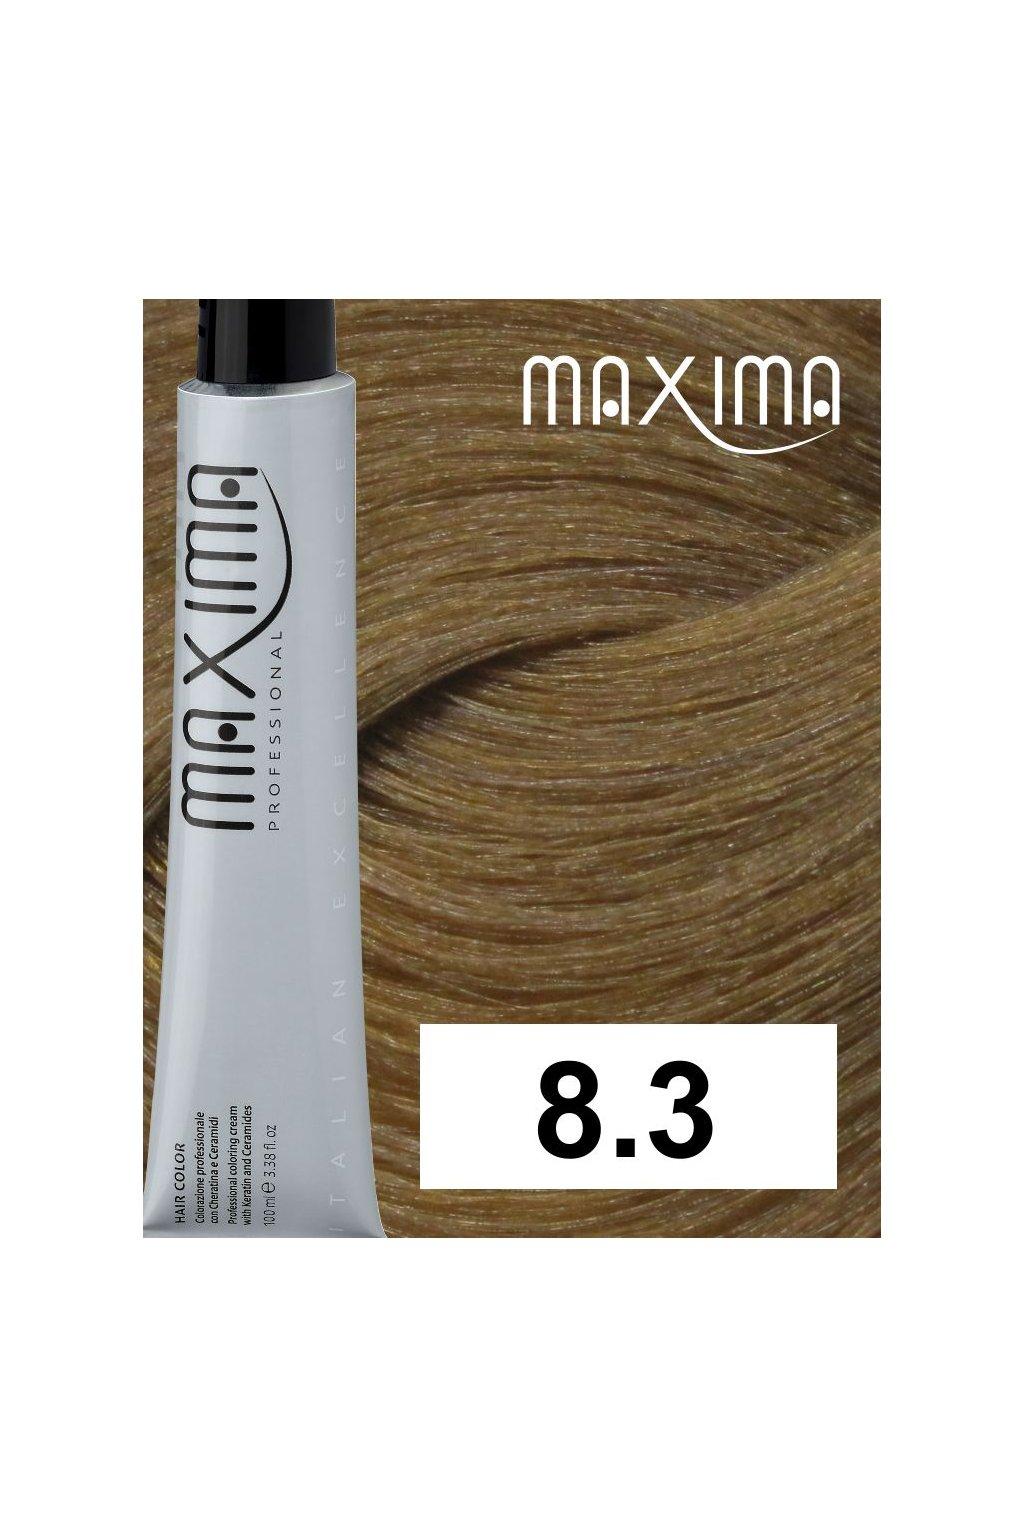 8 3 max